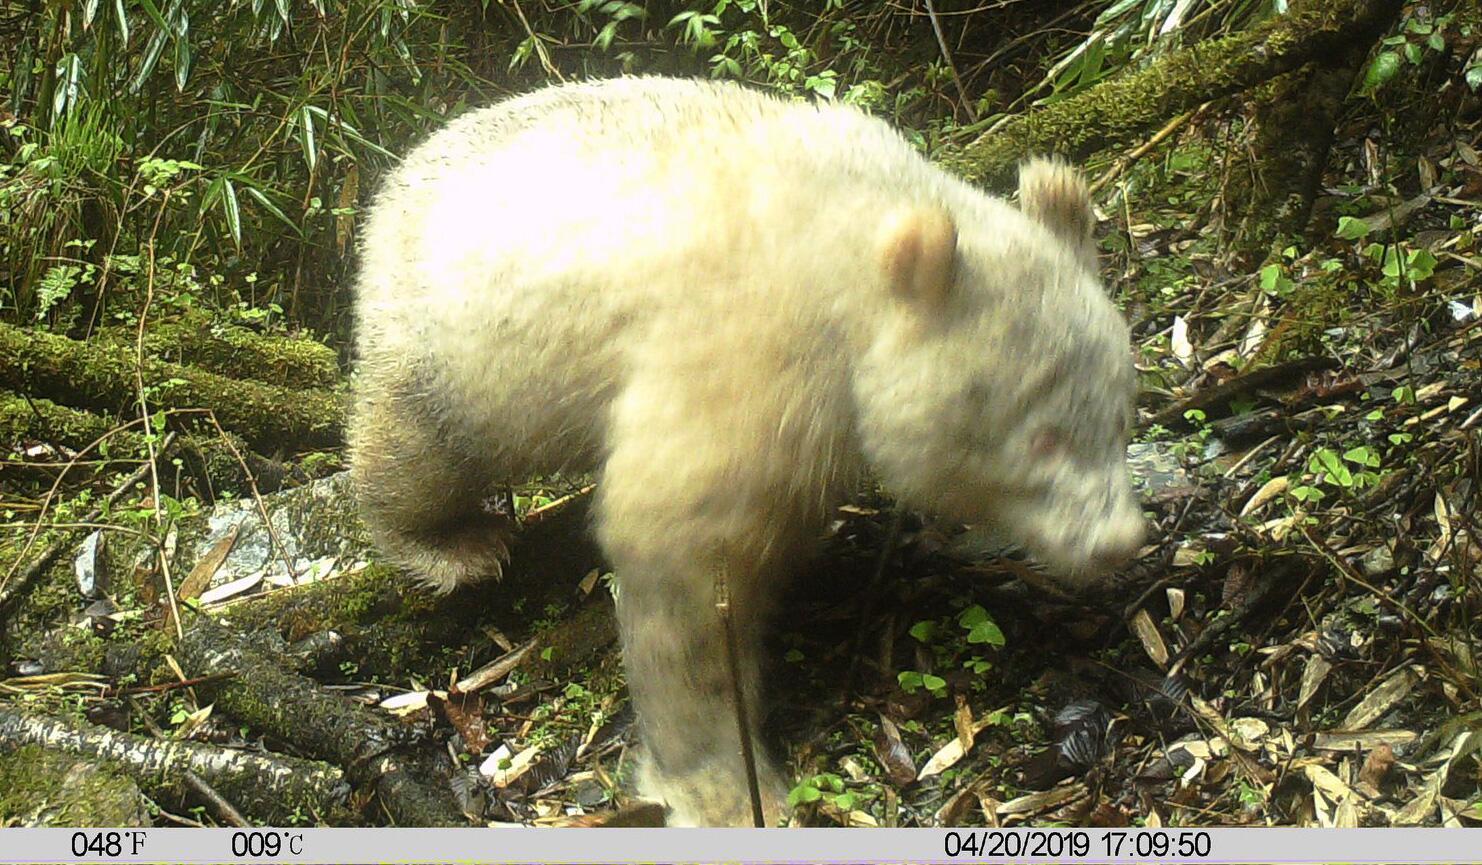 Bild zu Albino-Panda in China